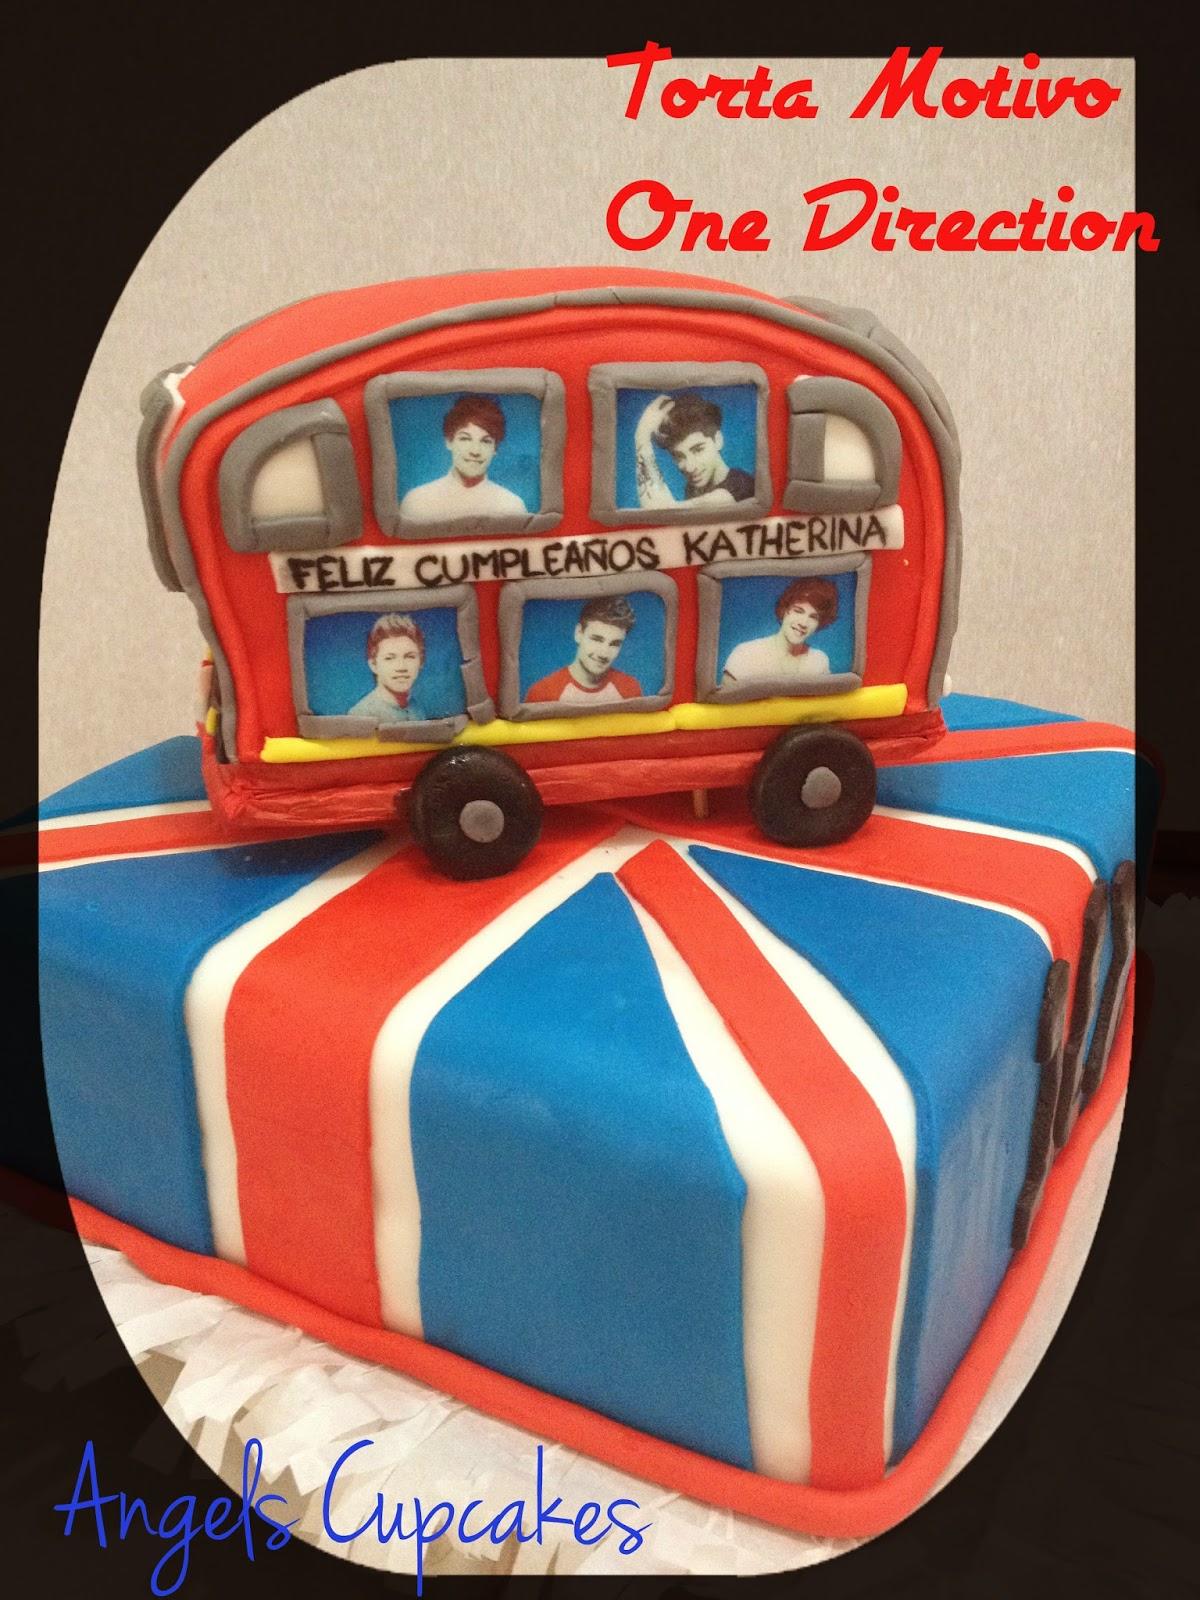 Reino Unido Bandera One Direction Bandera Del Reino Unido